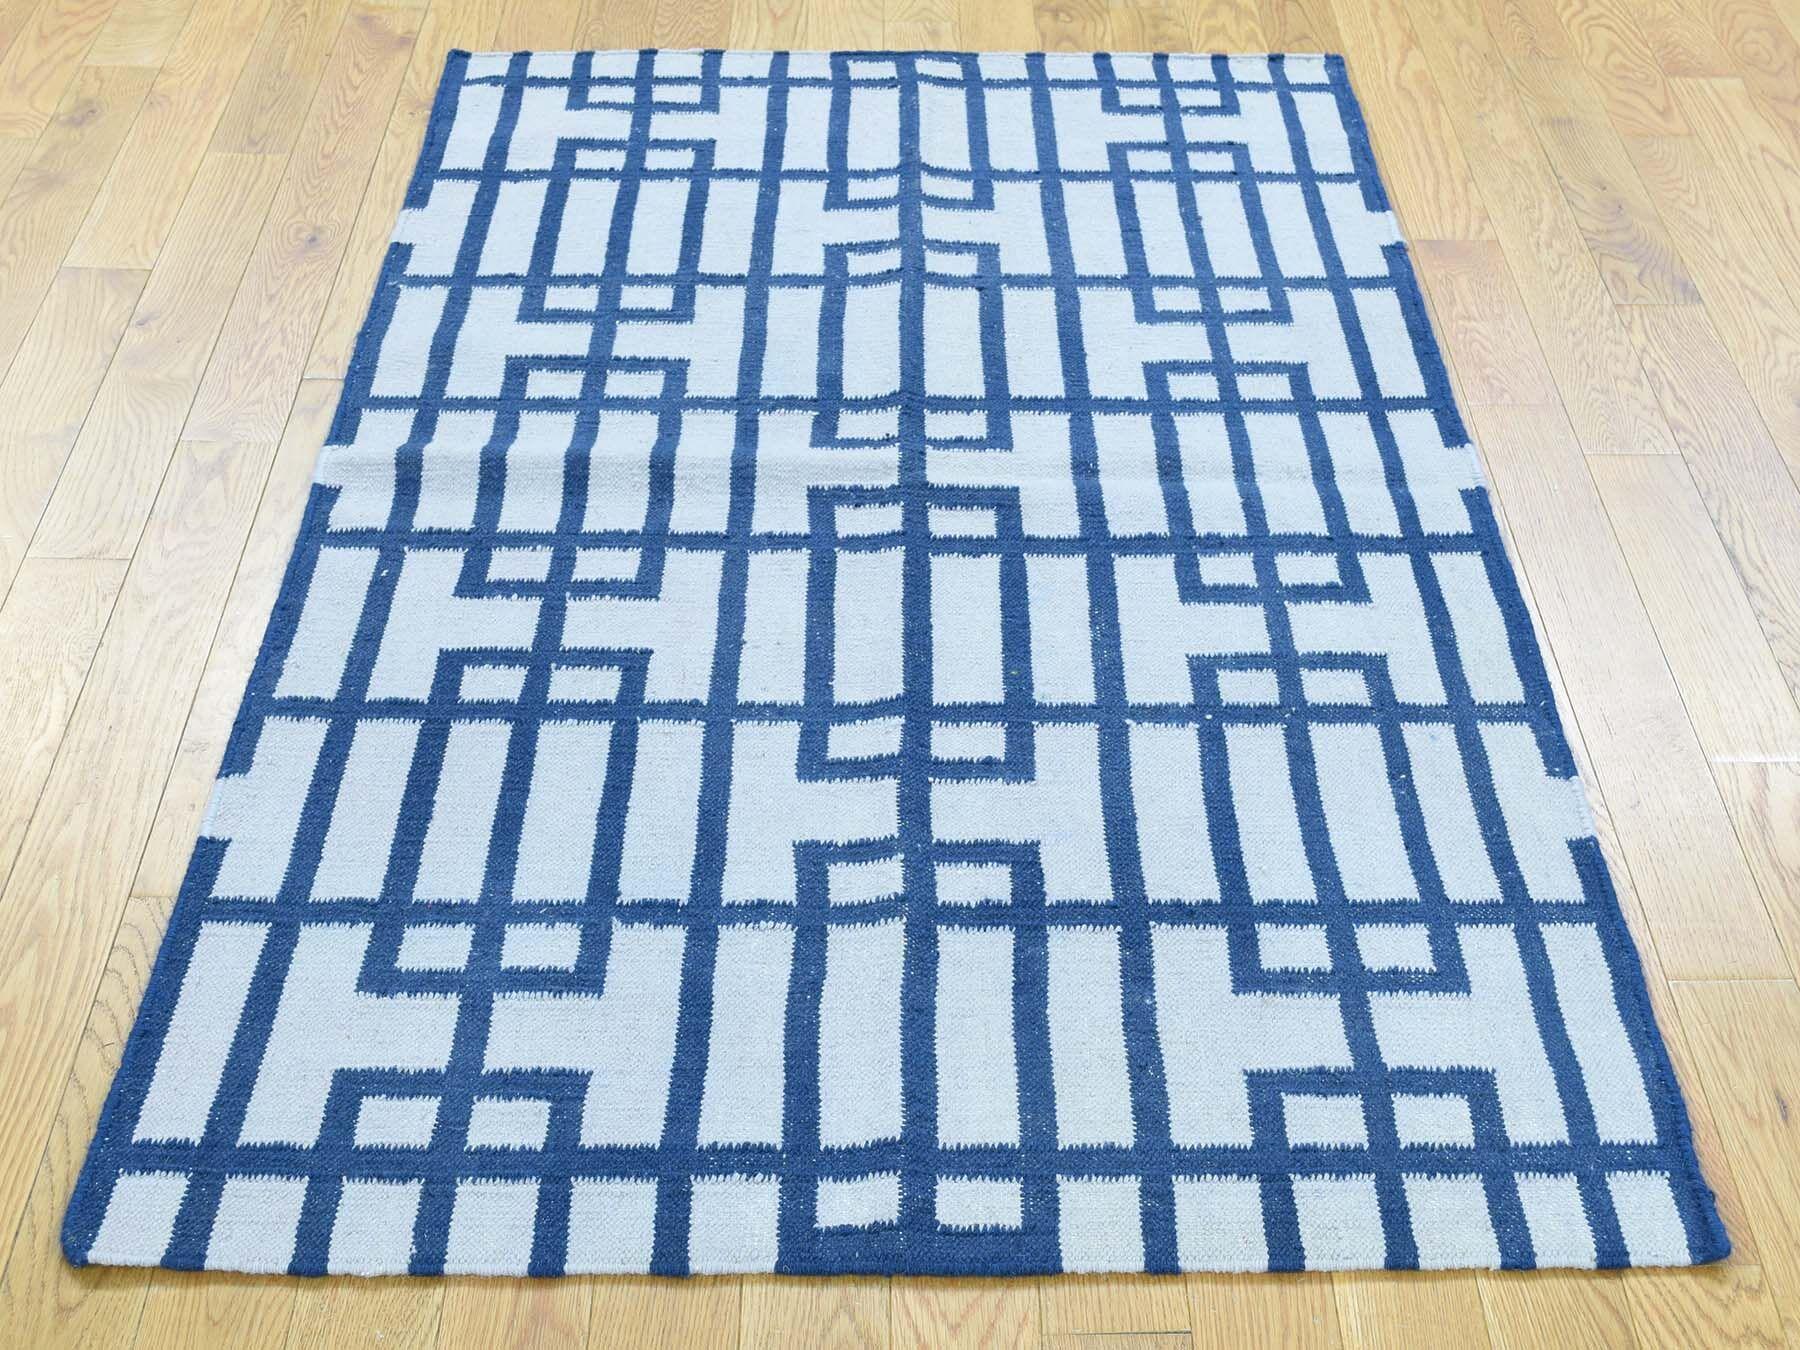 One-of-a-Kind Bravo Geometric Design Reversible Handmade Kilim Ivory Wool Area Rug